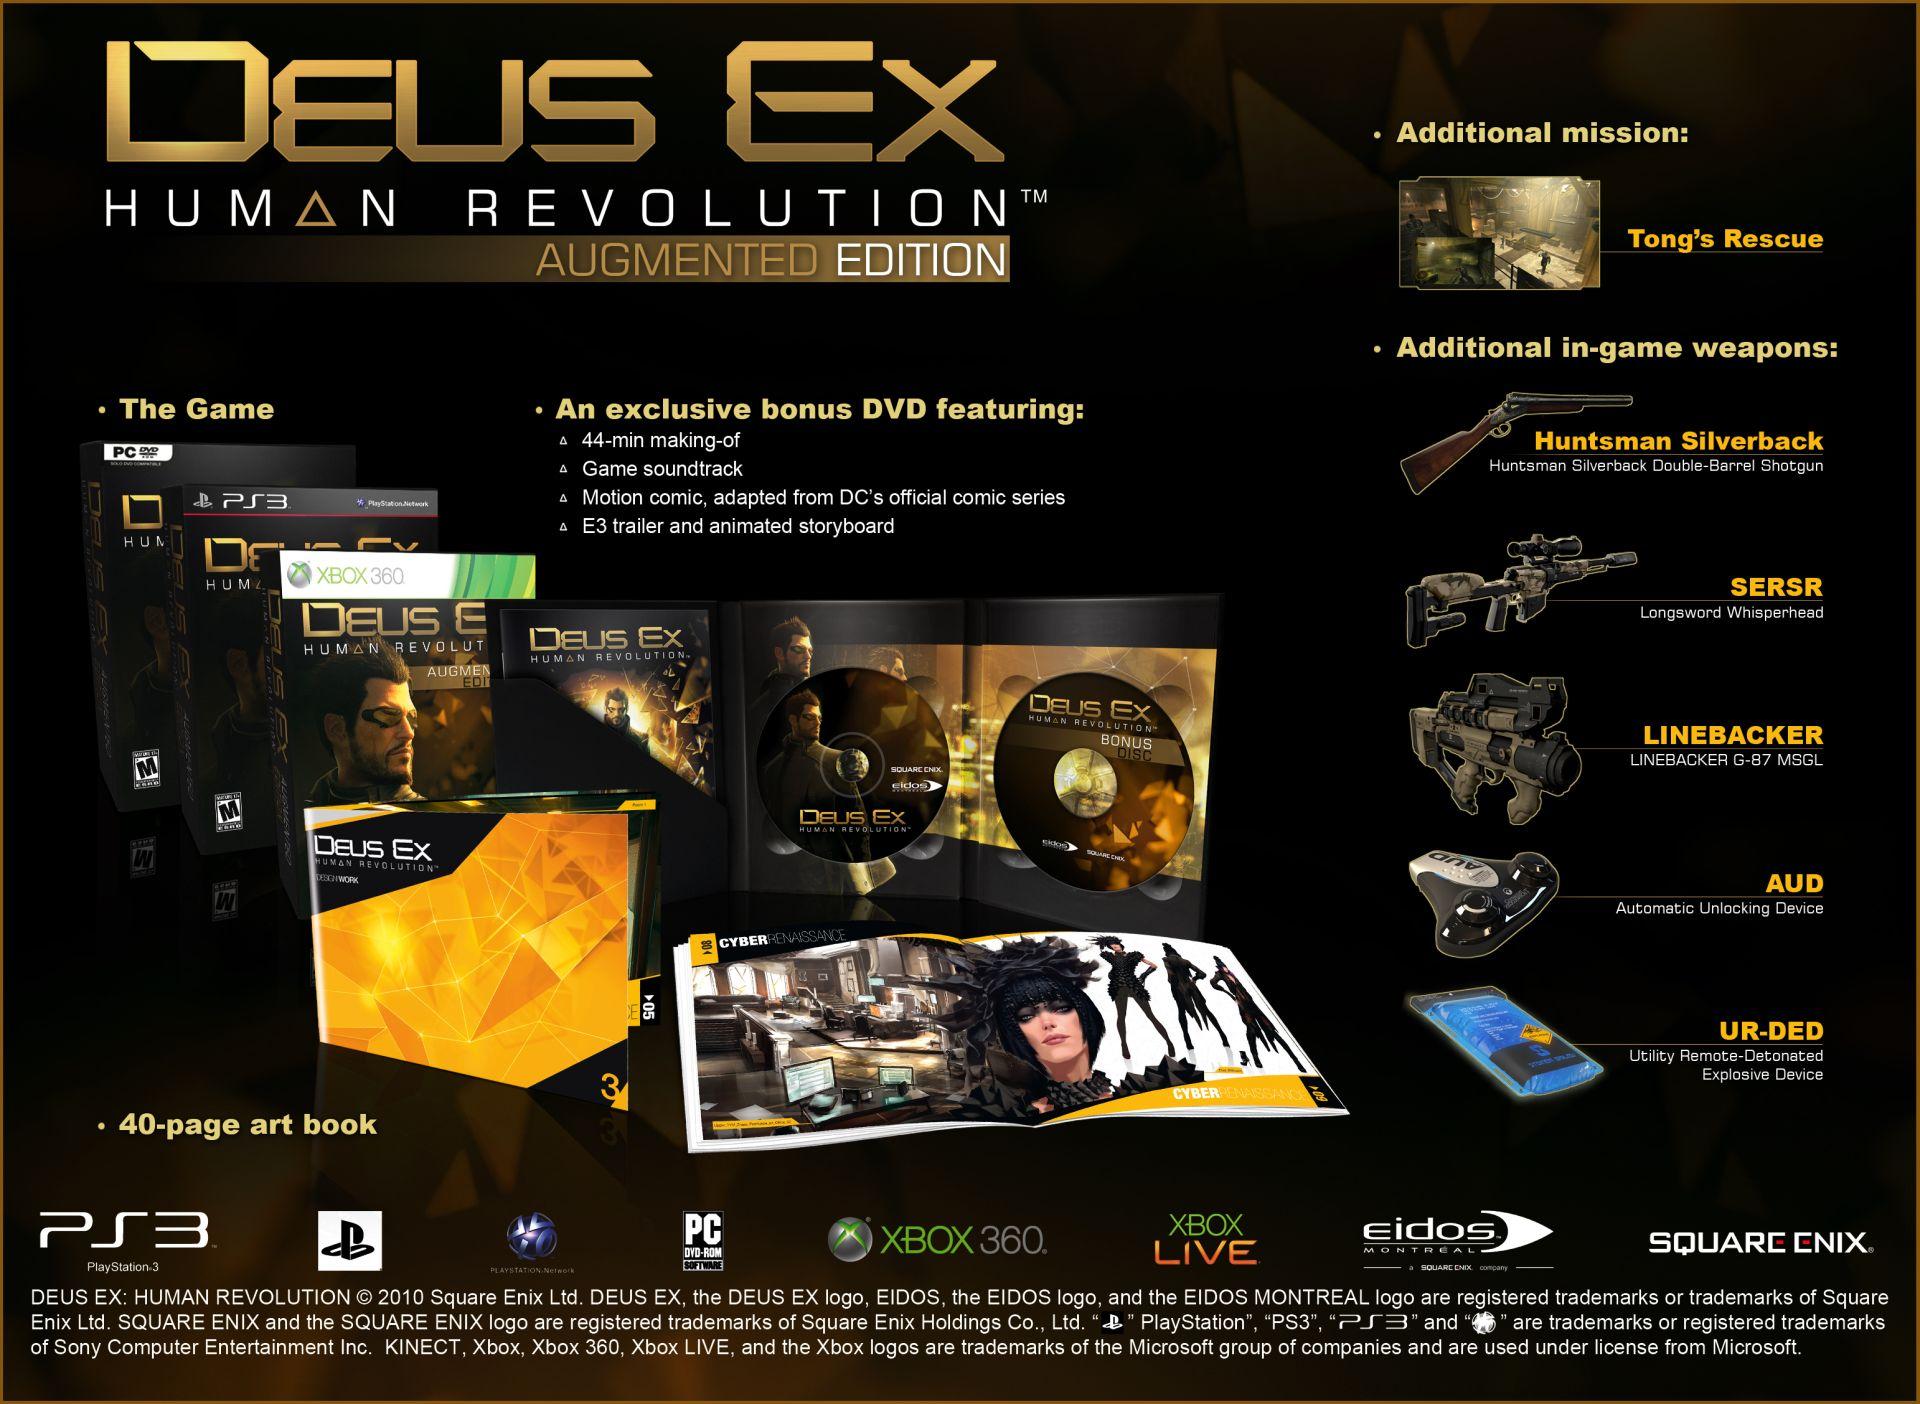 Jak si vybrat edici Deus Ex: Human Revolution 48406